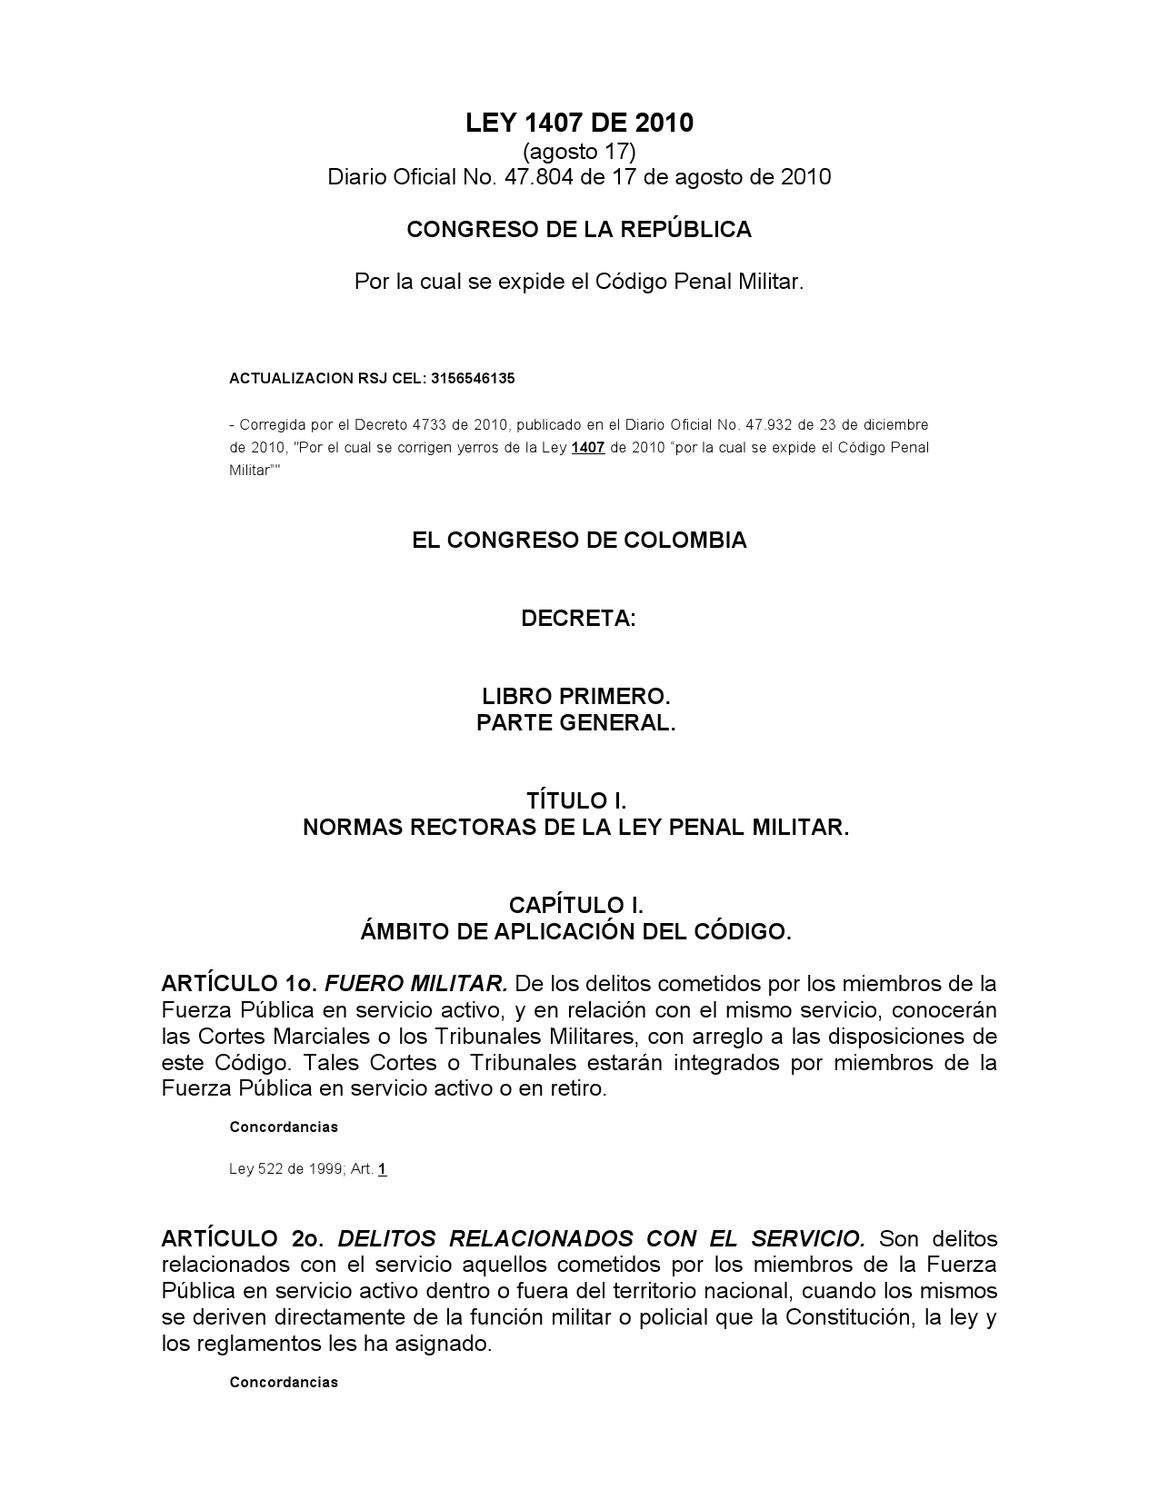 CODIGO PENAL MILITAR by Mauricio Martinez - issuu